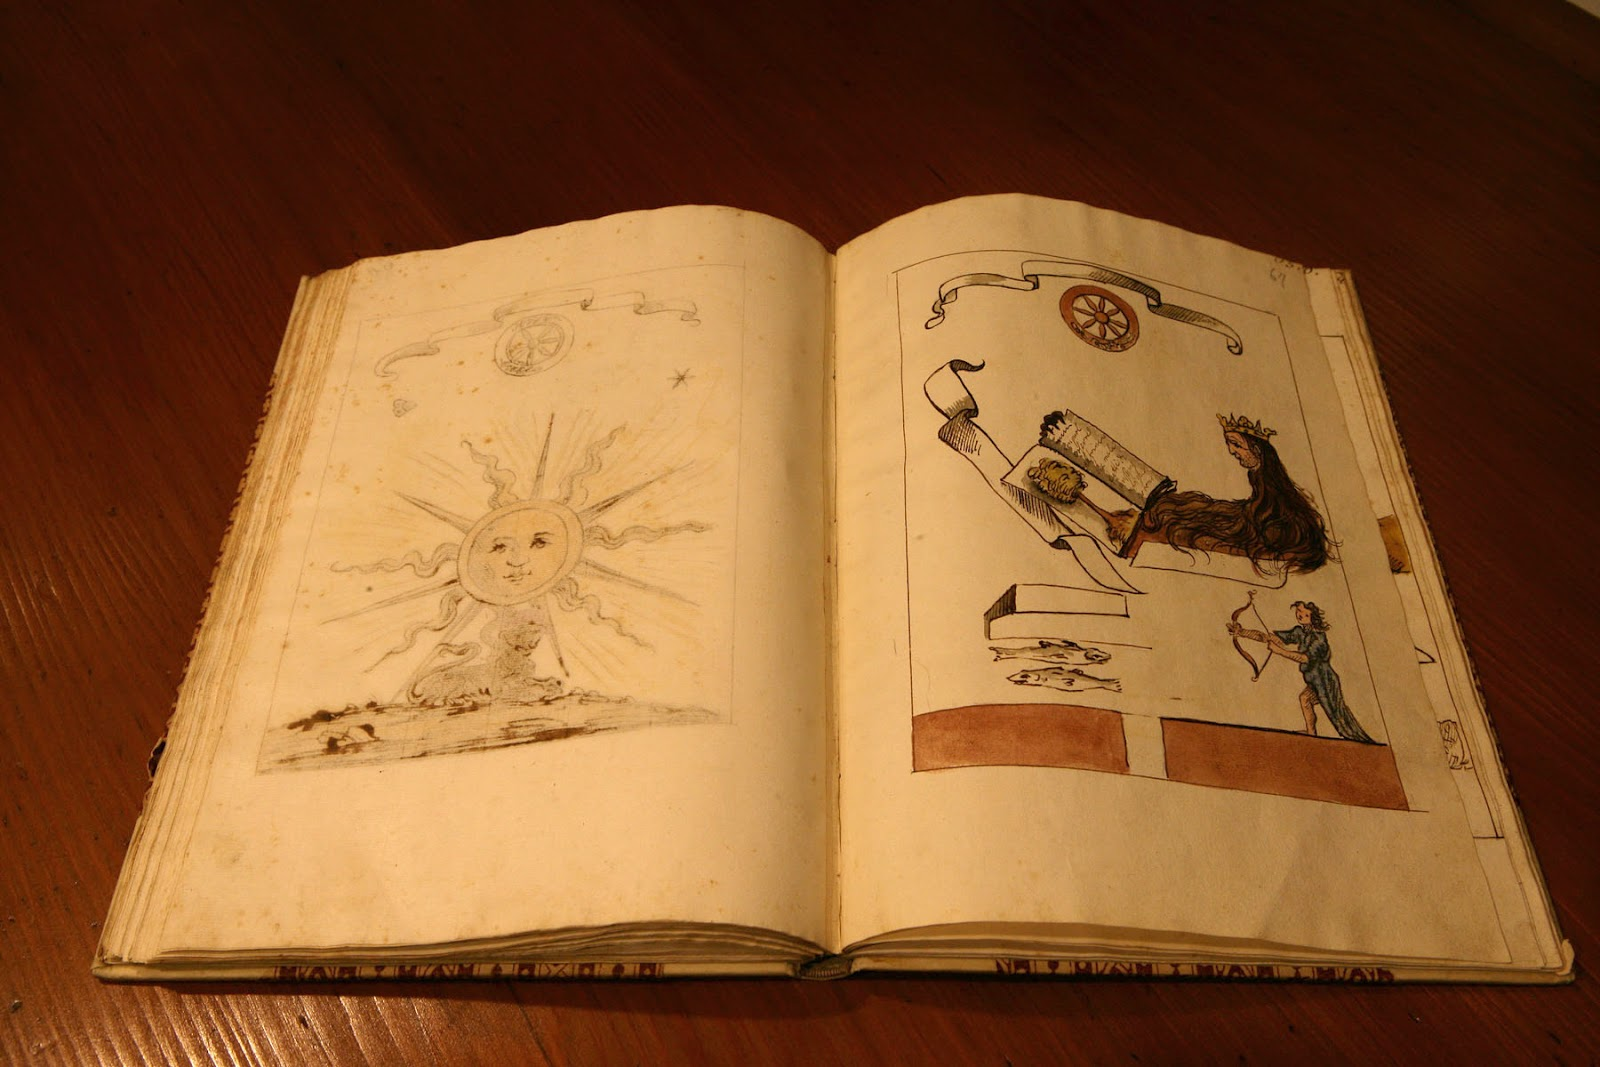 http://www.bibliotecapleyades.net/profecias/nostradamus/Lost_Book_Of_Nostradamus_1.jpg